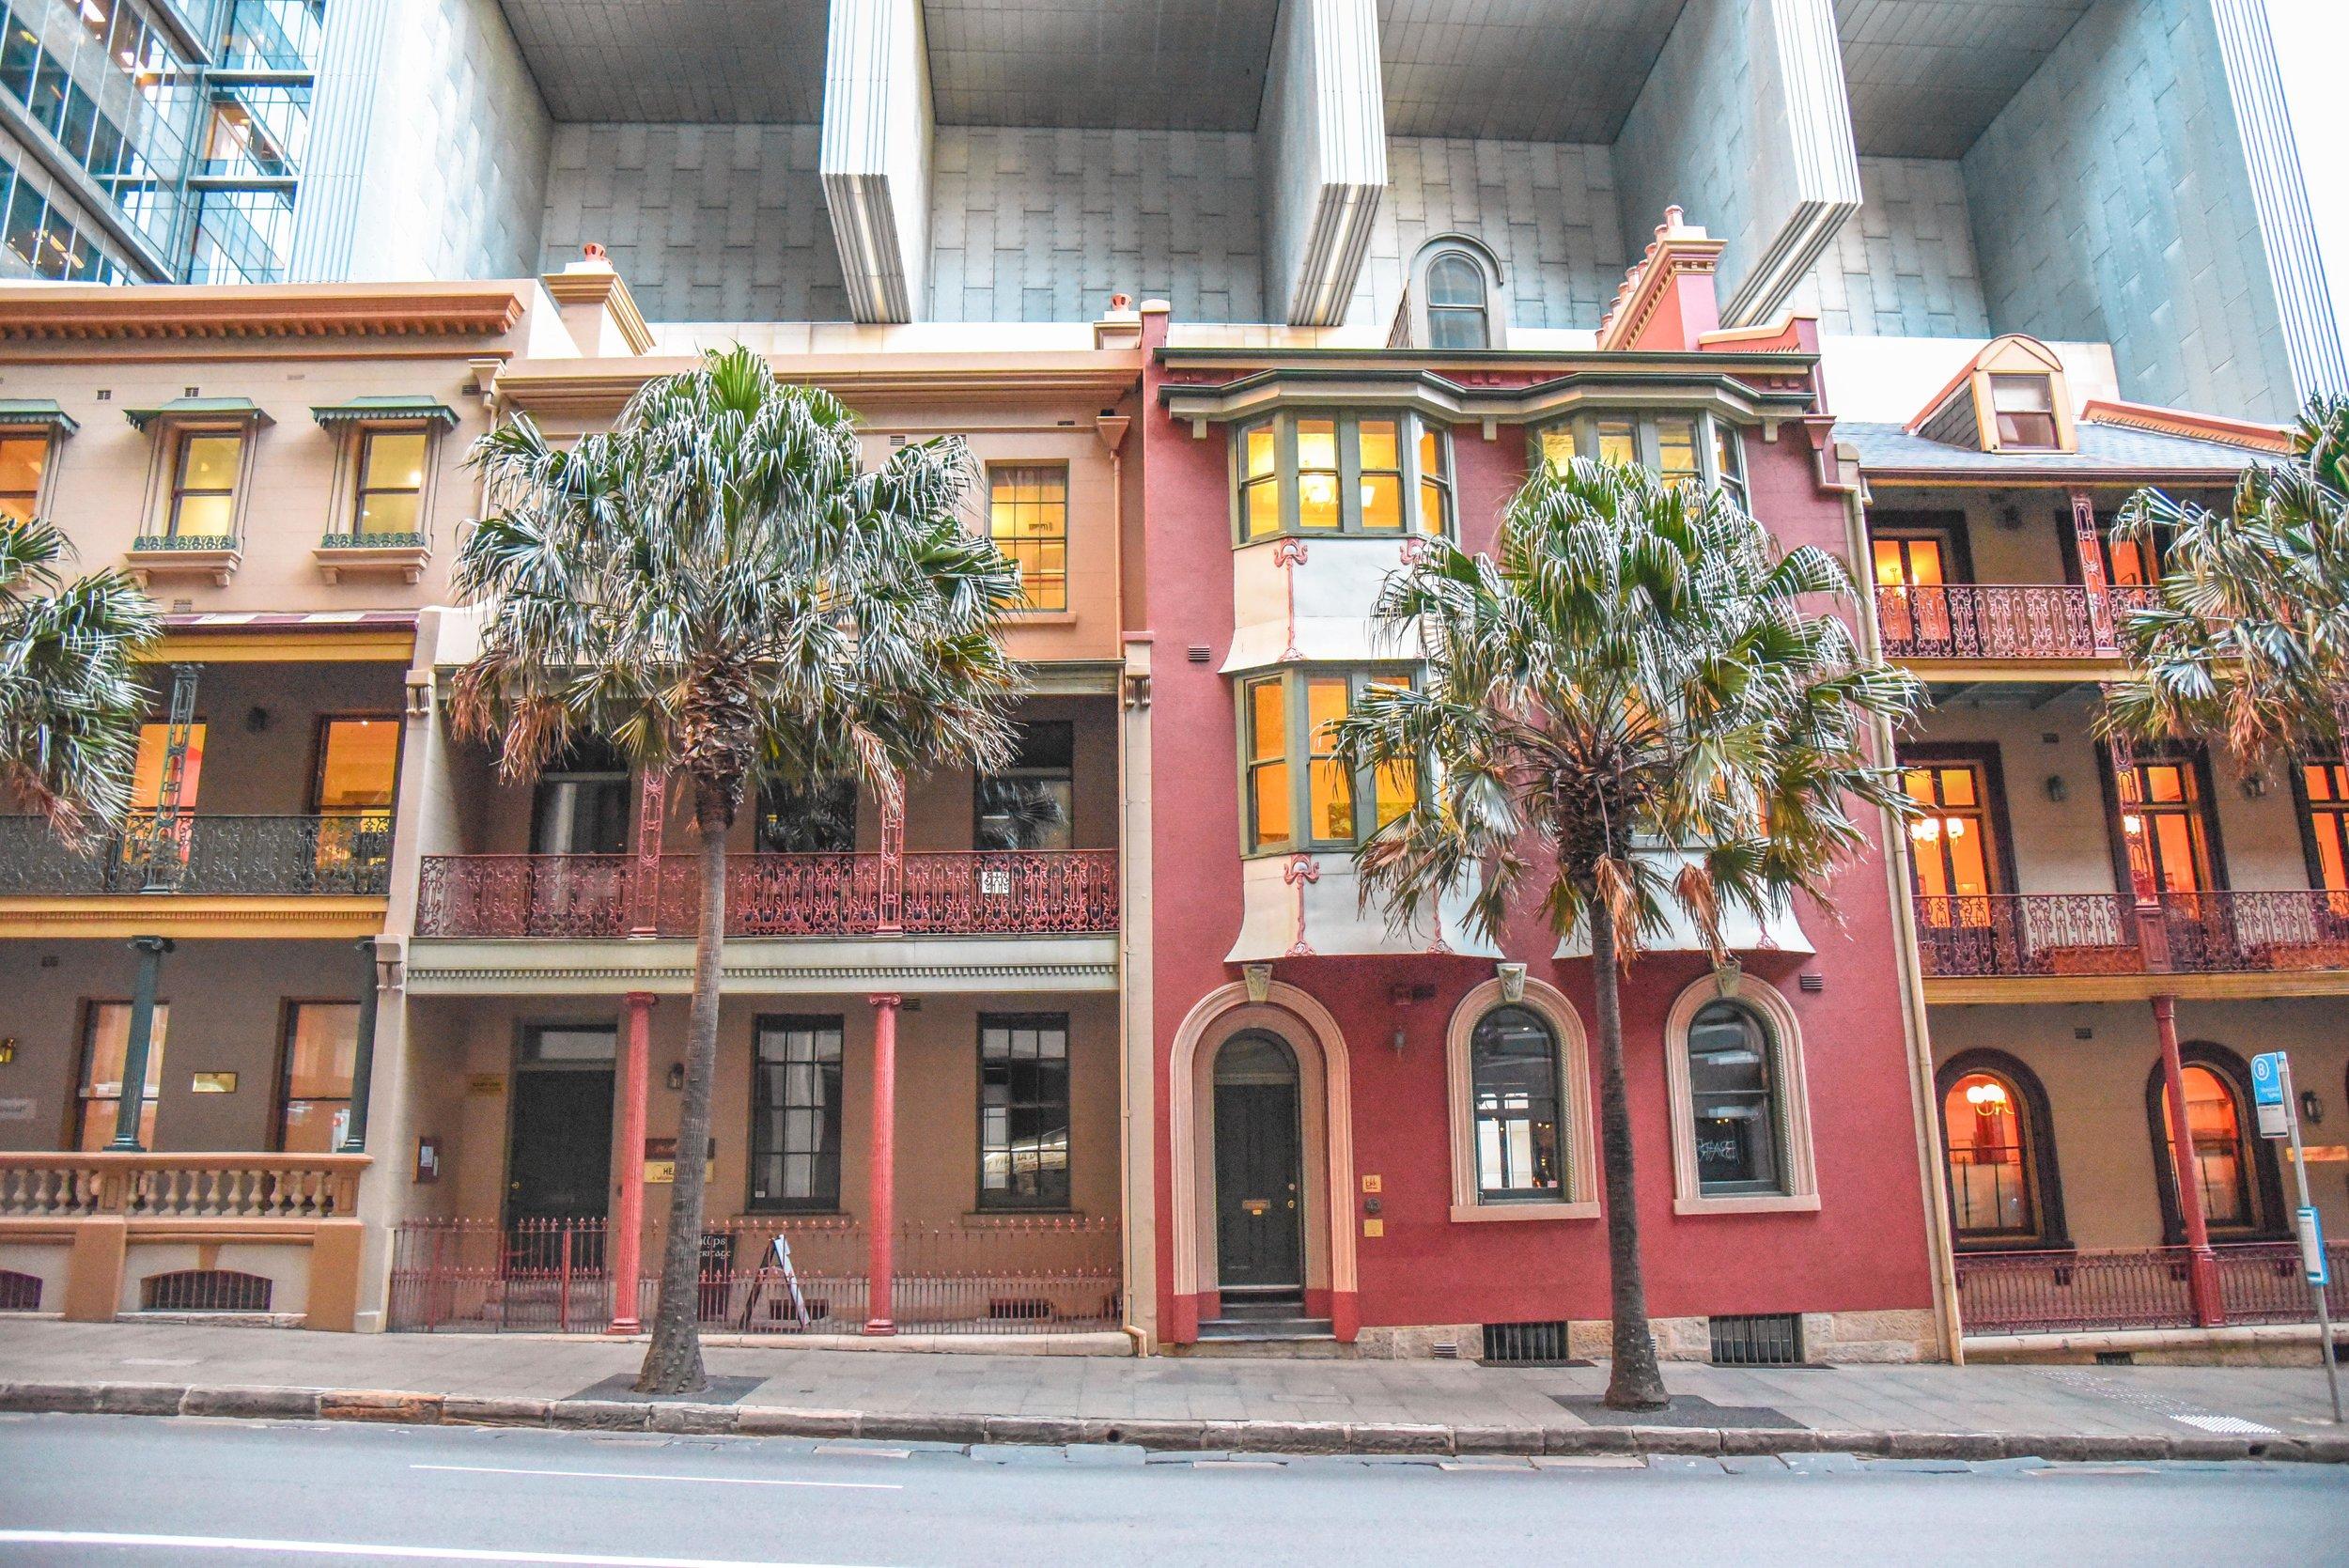 Exploring downtown Sydney